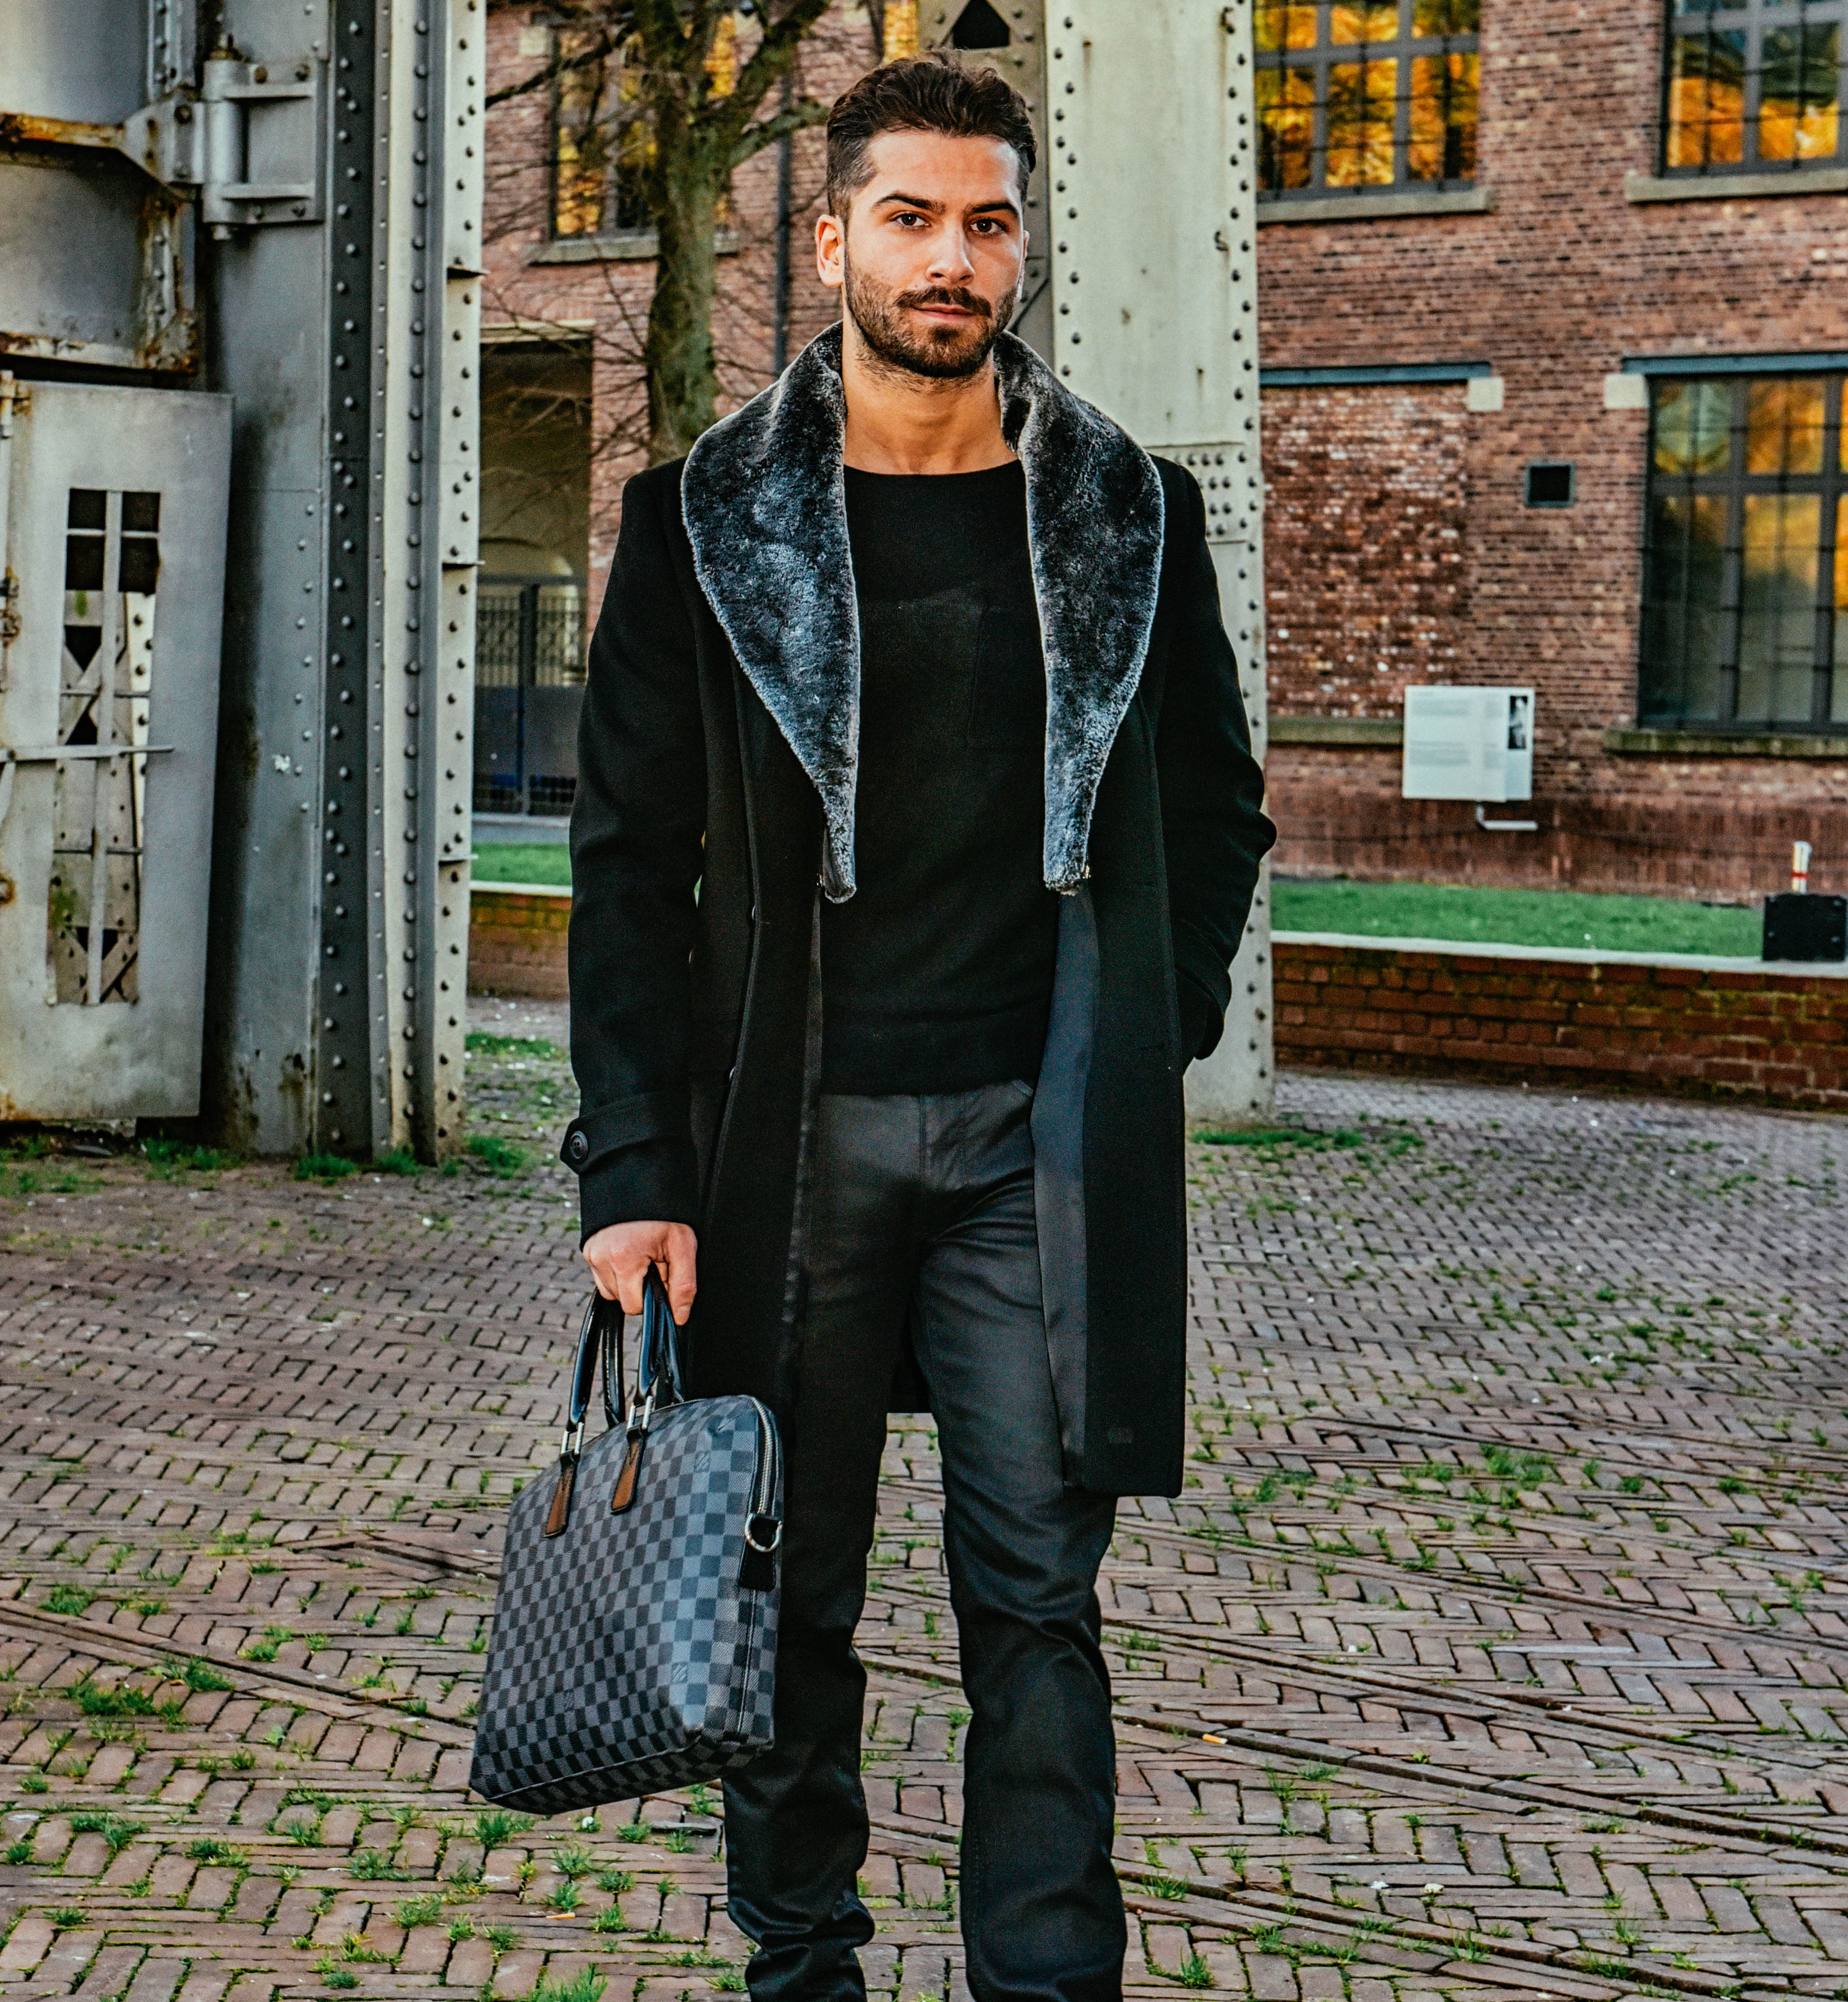 Schwarzer langer mantel mit pelz descy official - Schwarzer langer mantel ...